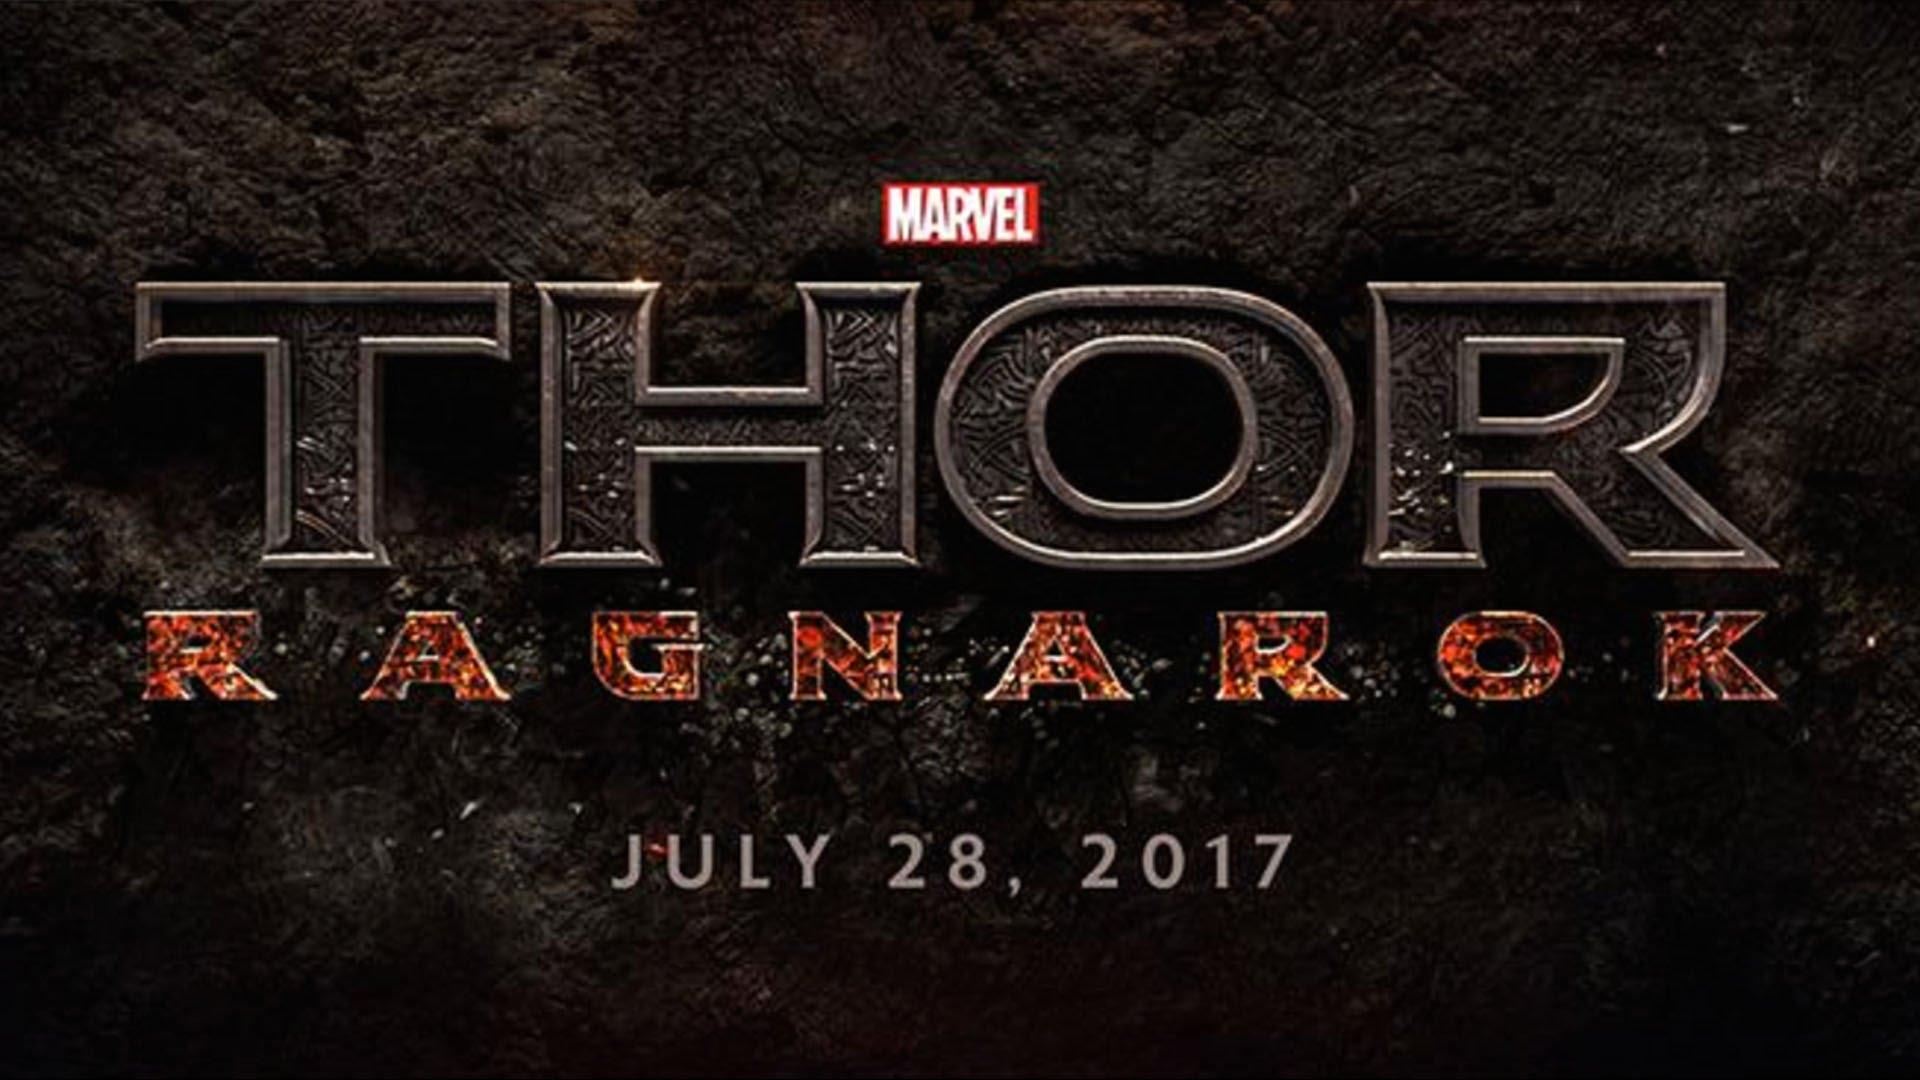 Thor: Ragnarok Screensavers